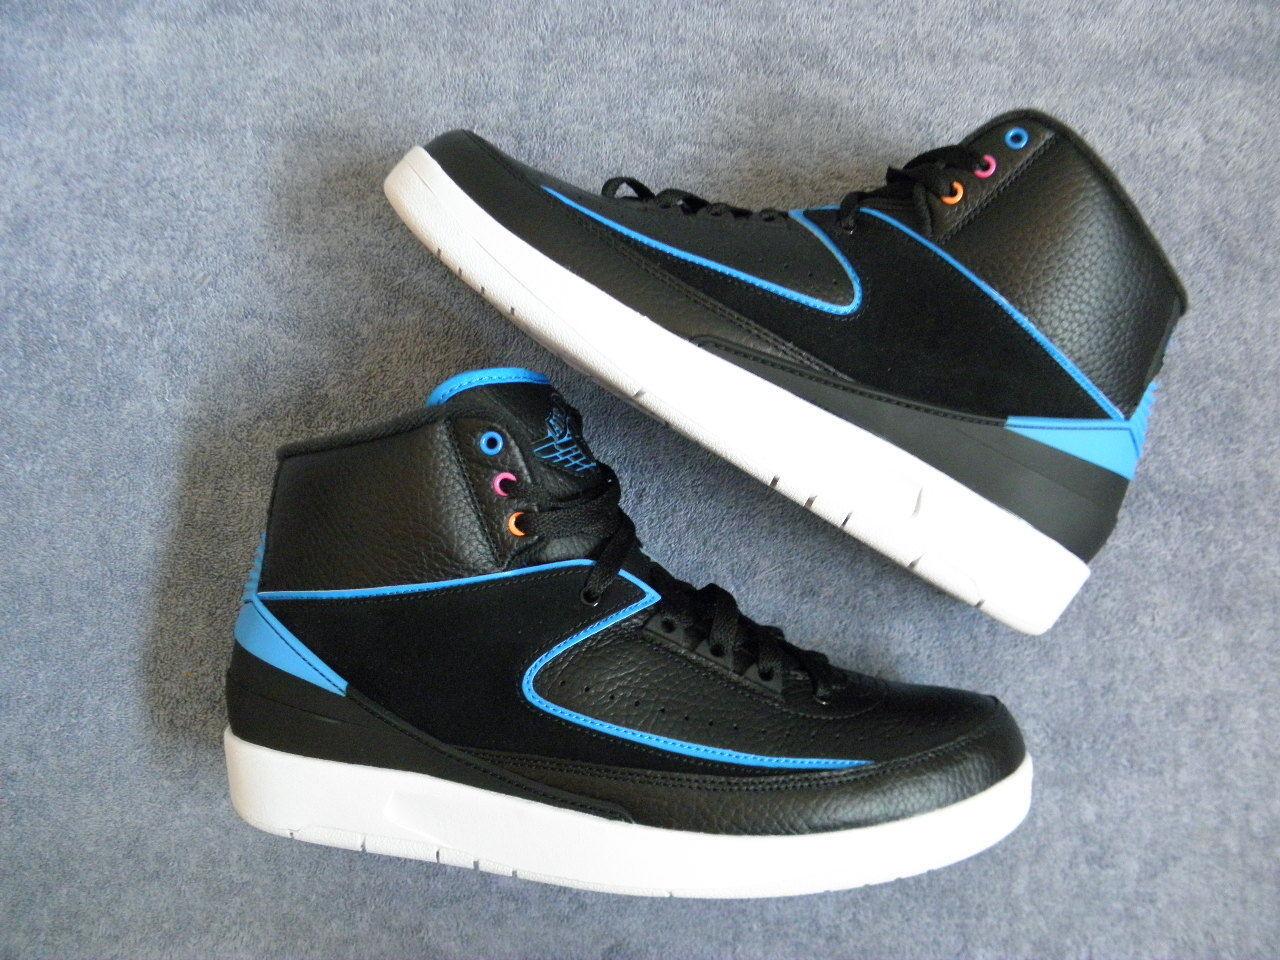 Nike Air Jordan Ii 2 Retro radio dtrt hacer lo correcto radio Retro Raheem ds nuevo e38808